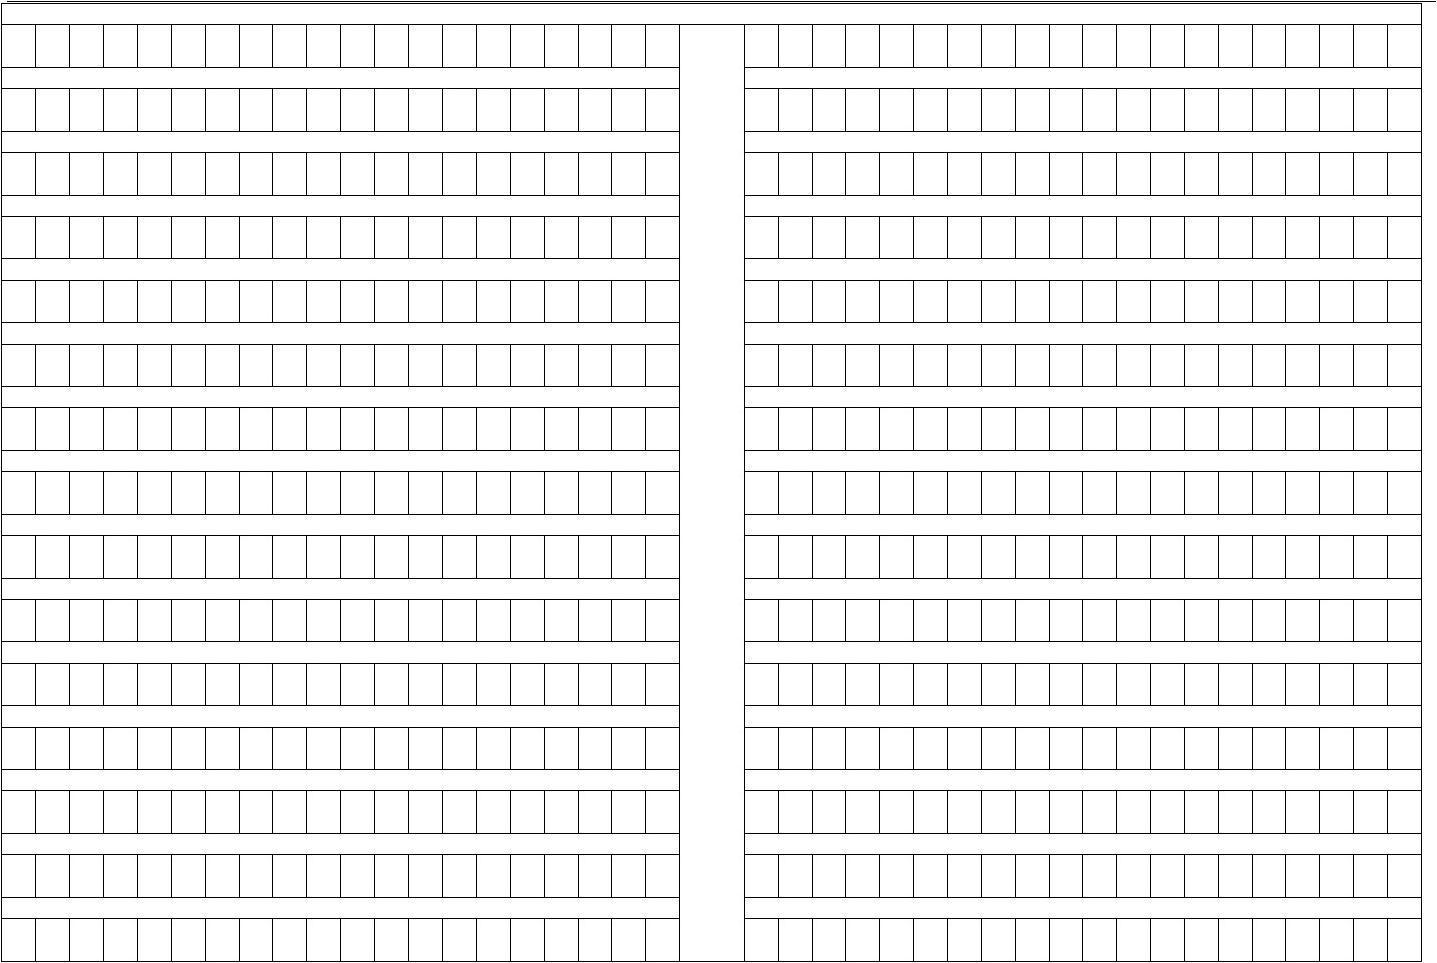 Word版8K模板纸小学v模板技术郑州作文信息图片